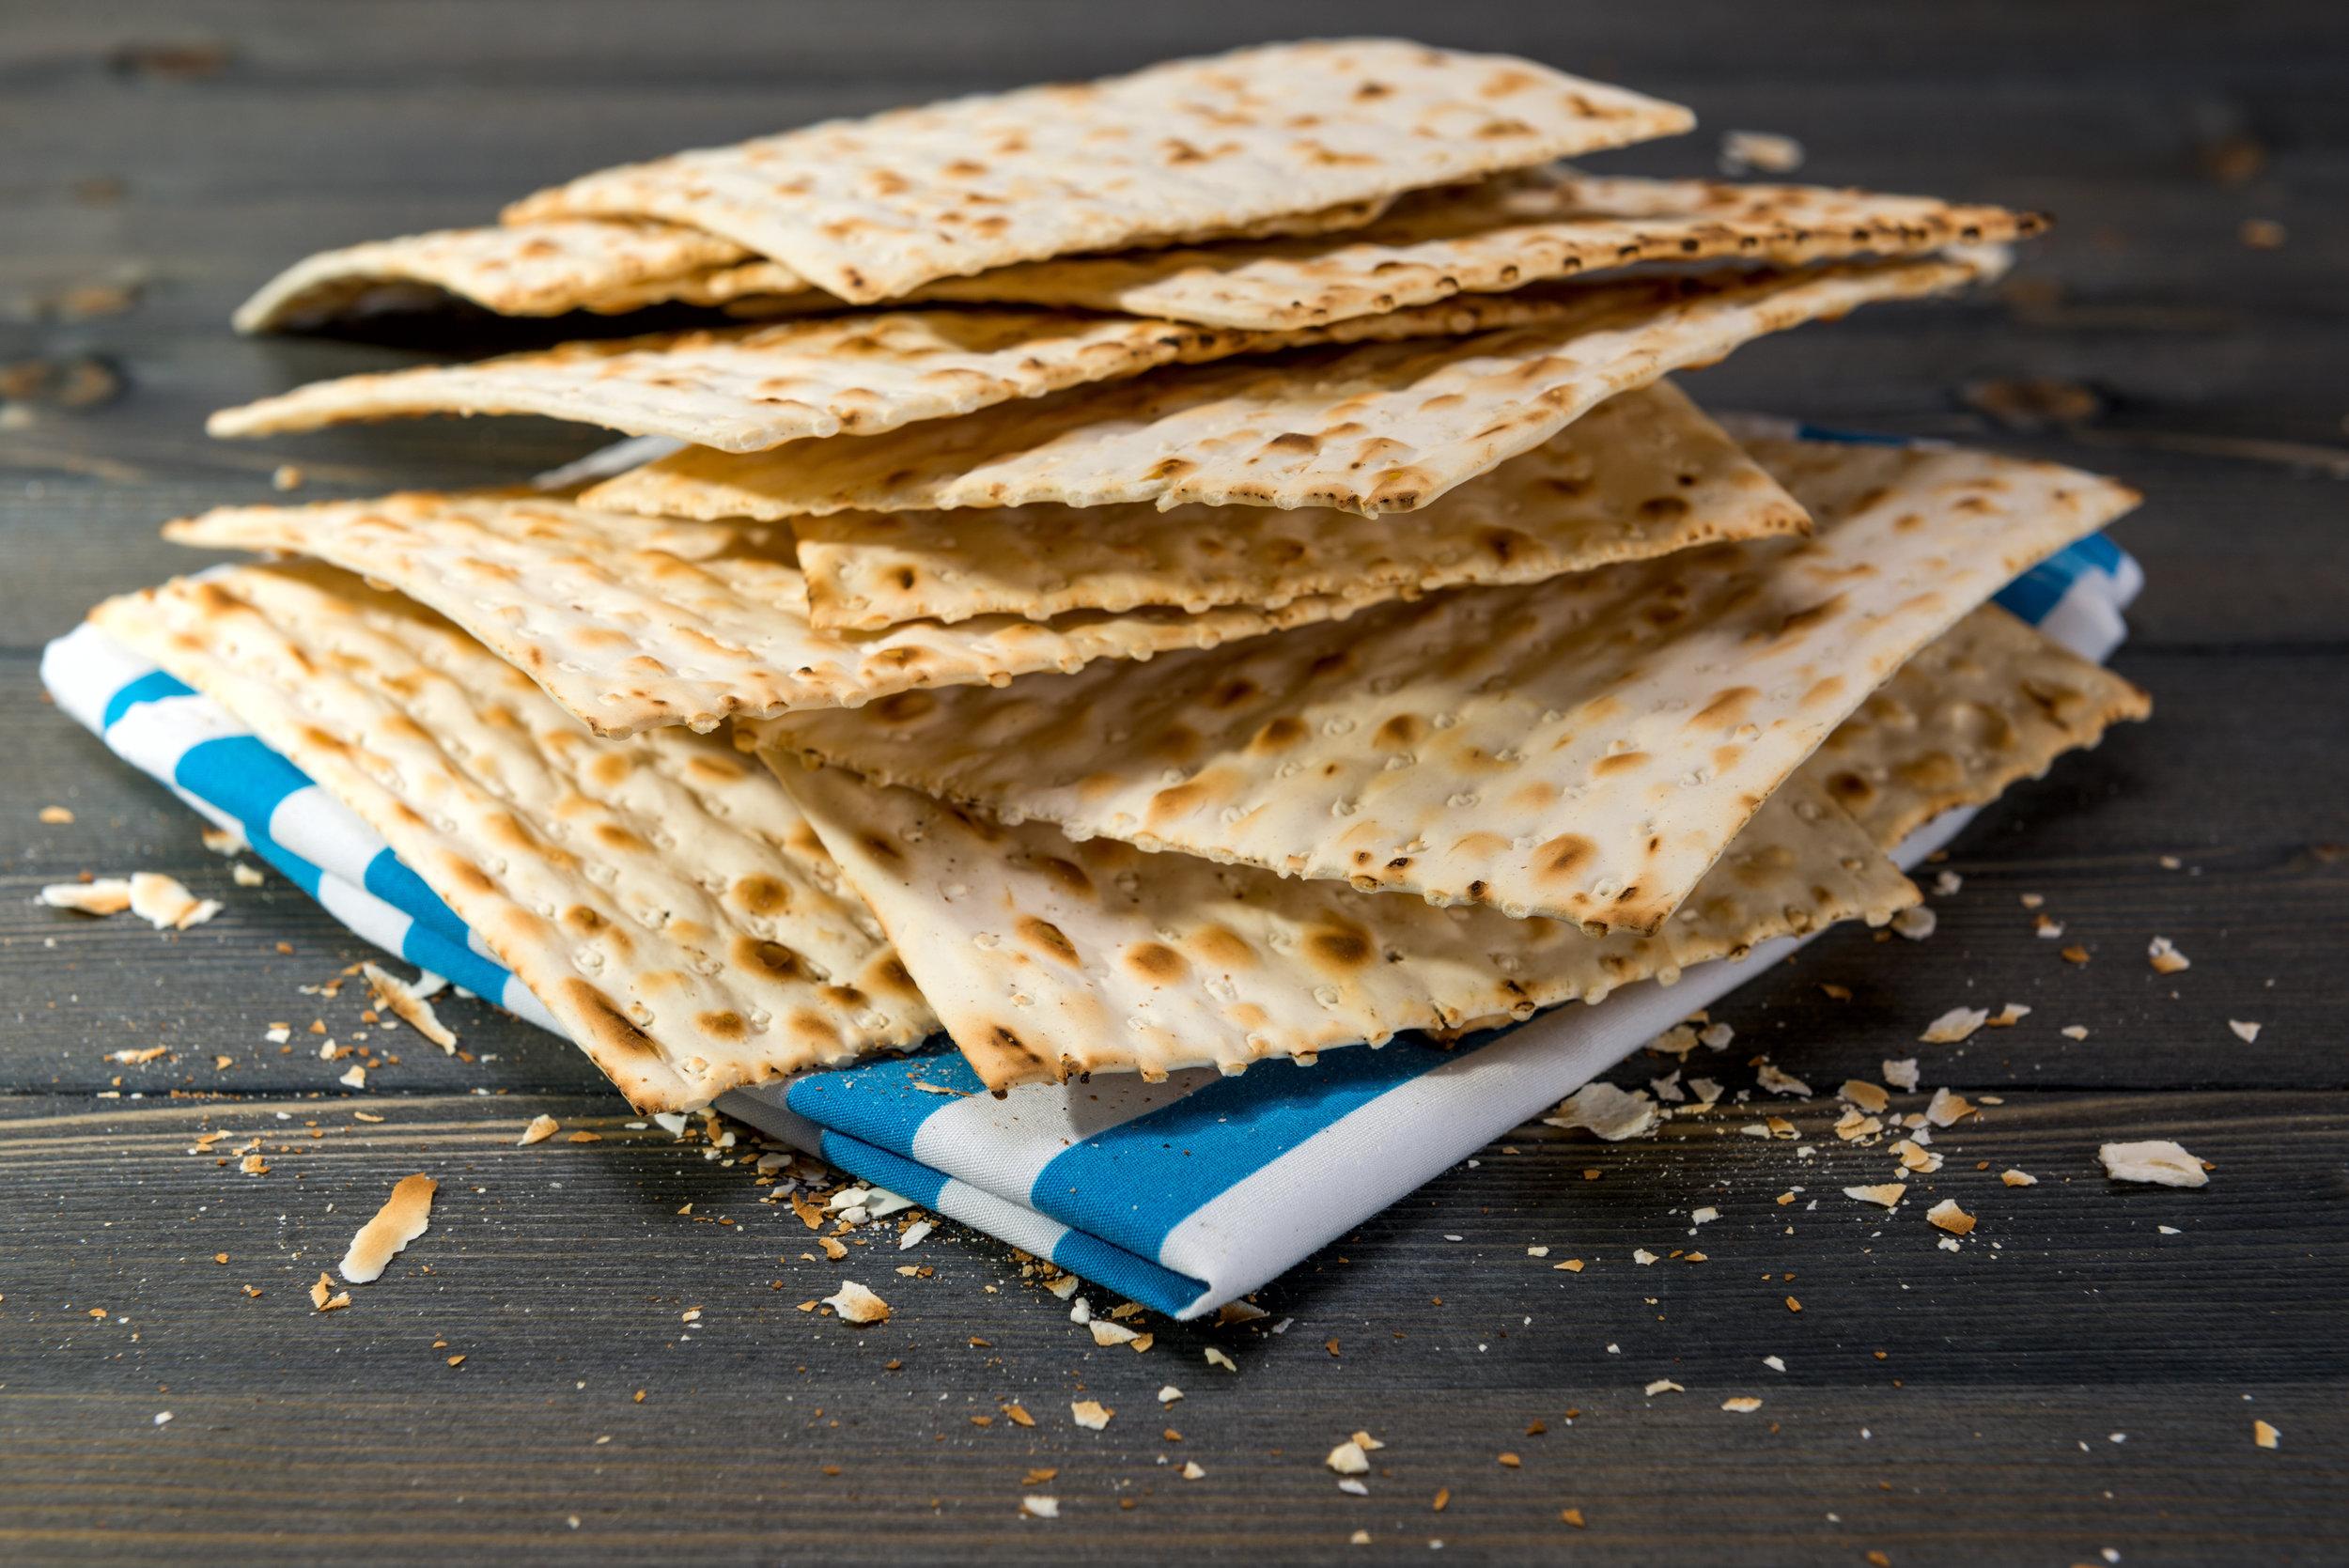 The matza, or unleavened bread